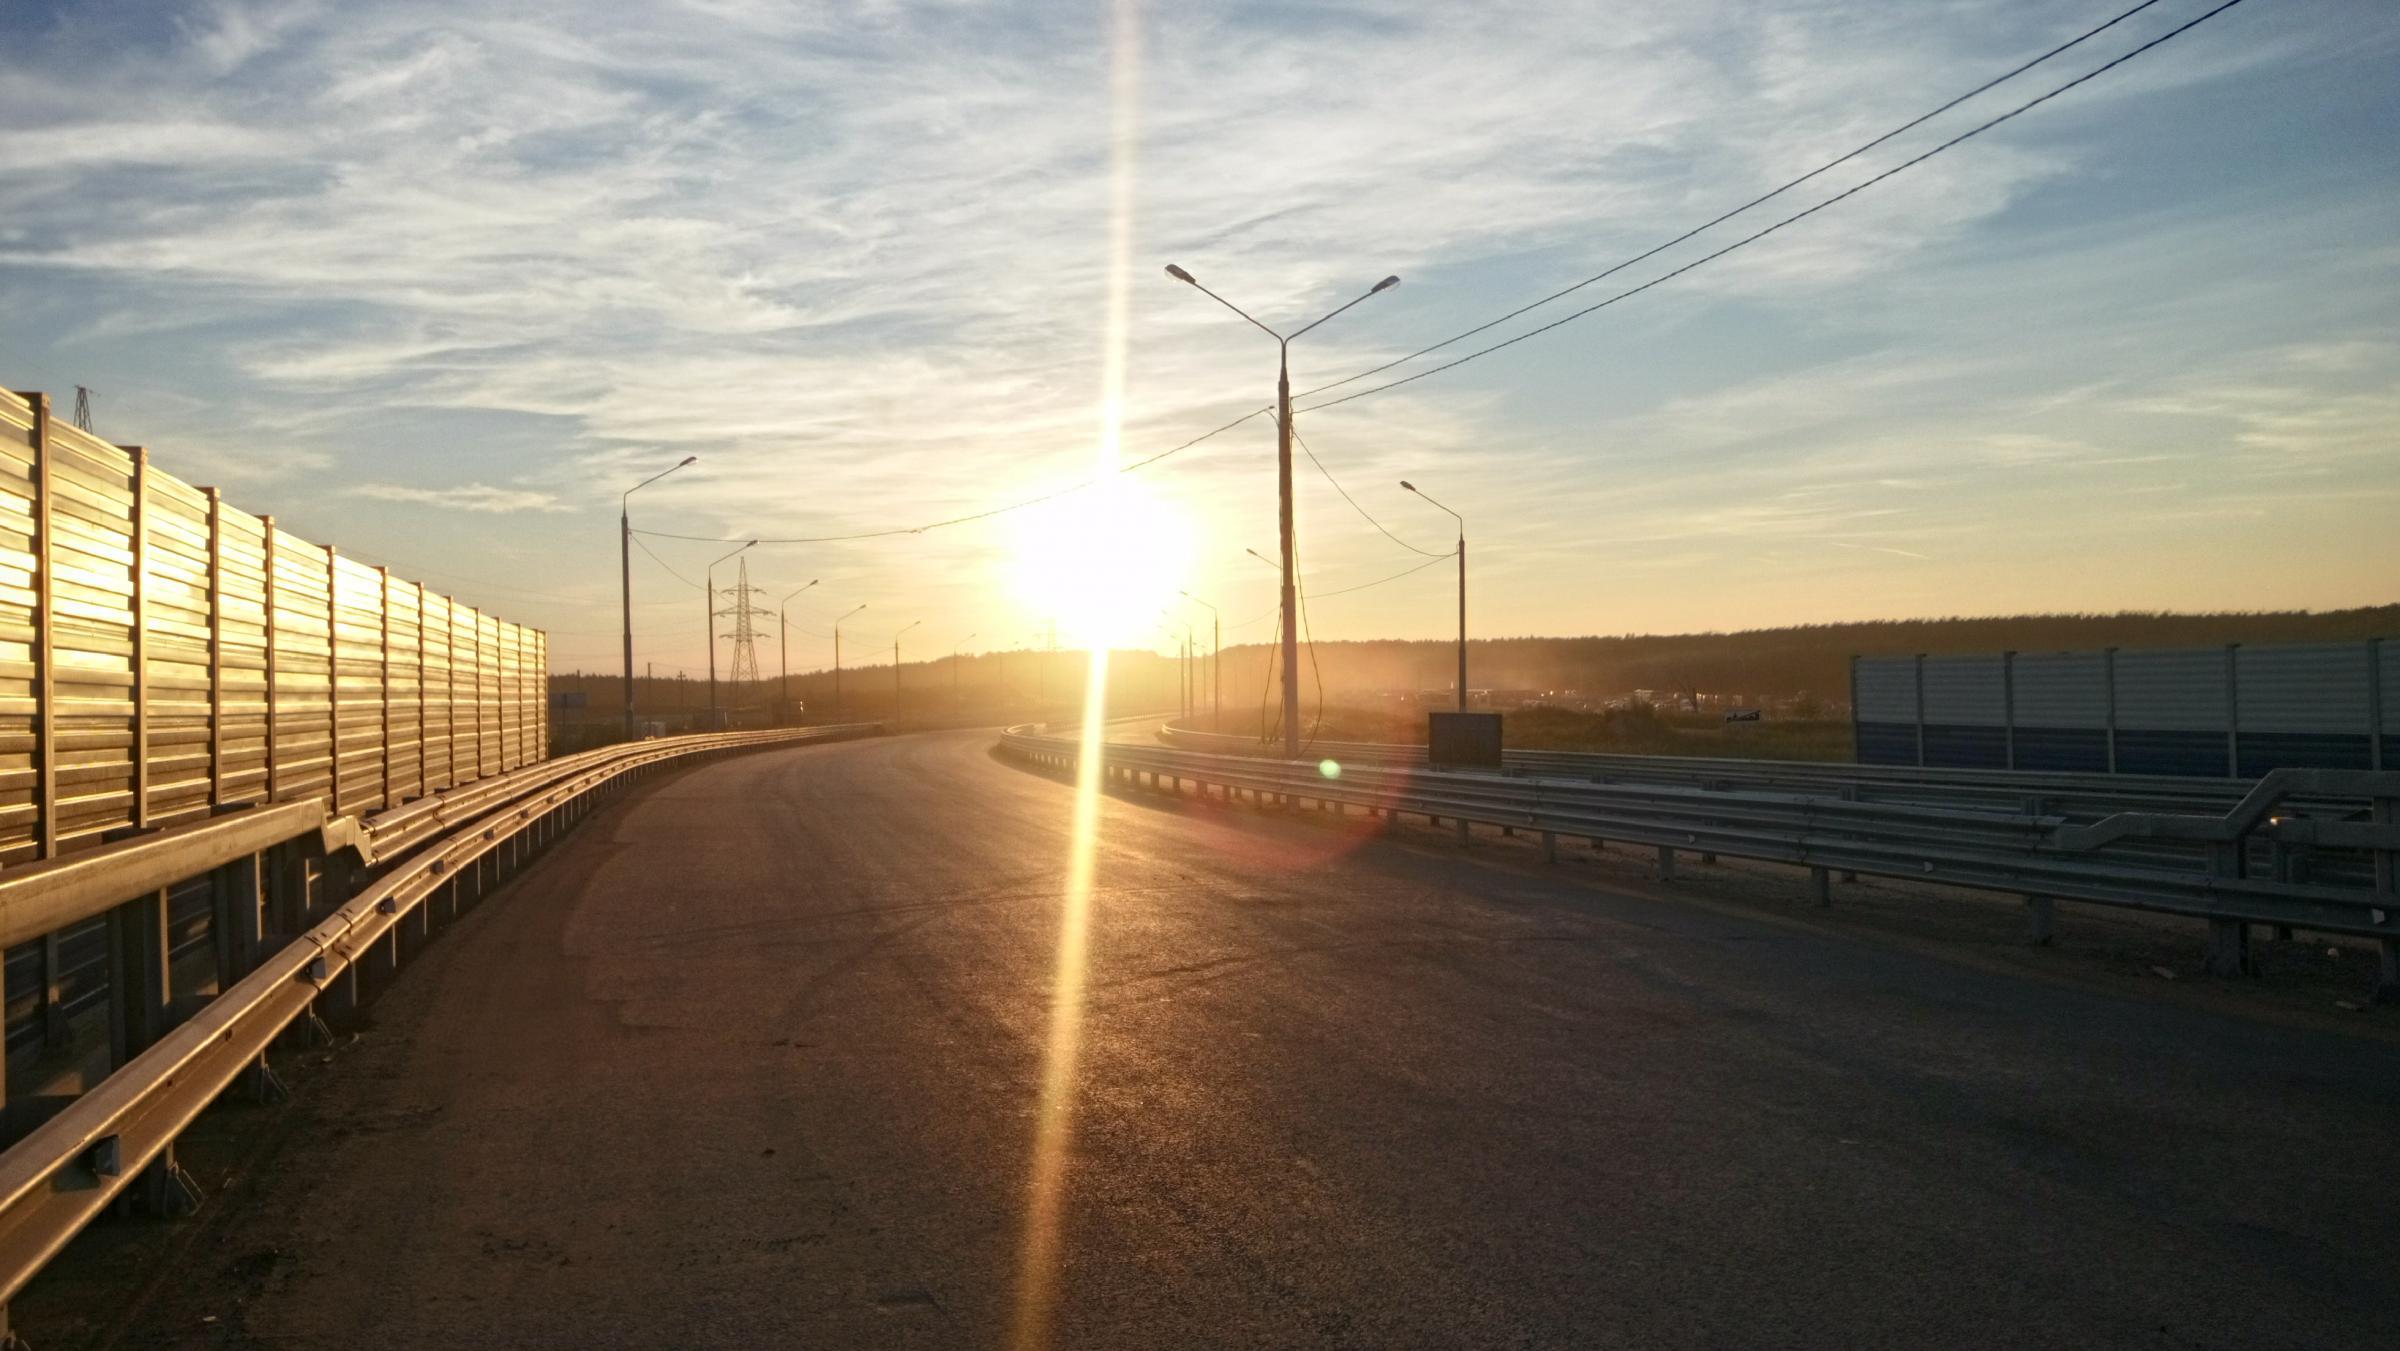 """Южный обход"" на закате. Мост через ж/д. Август 2016 г."